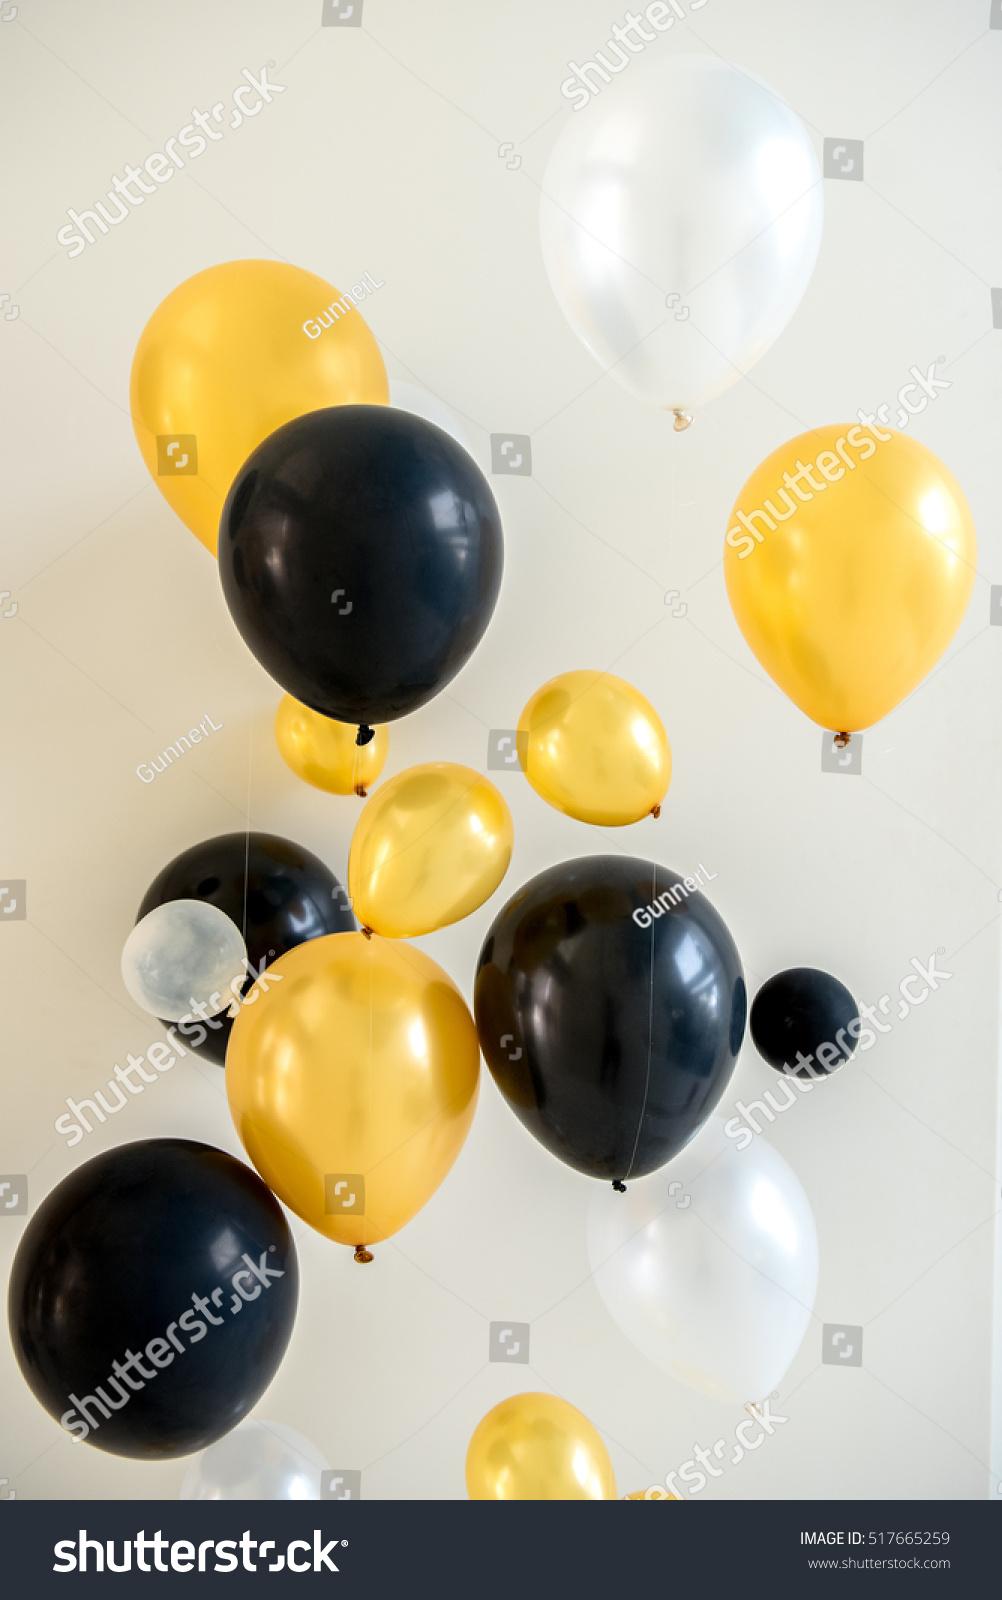 Many Bright Yellow White Black Balloons Stock Photo & Image (Royalty ...